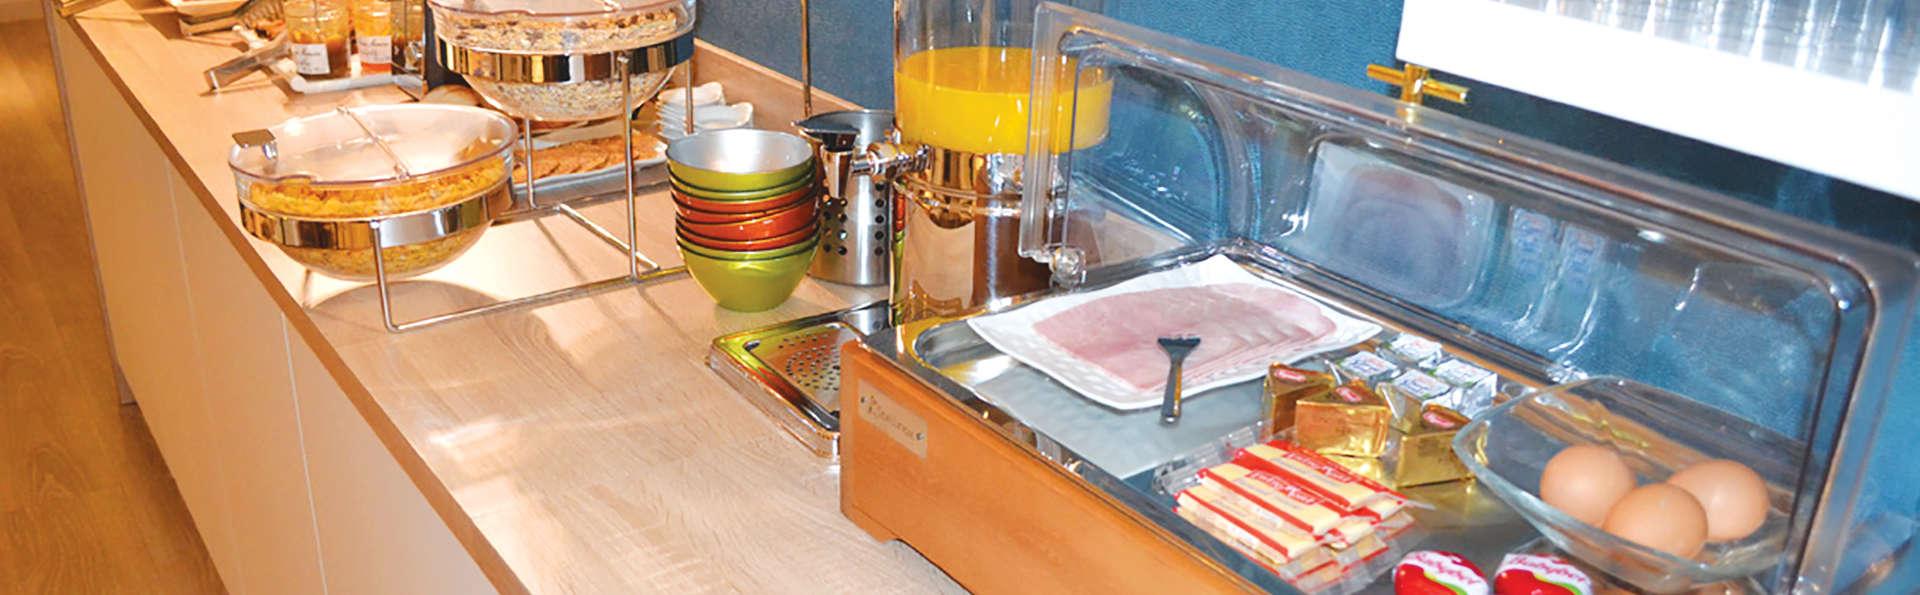 Brit Hotel Les Alizés - EDIT_Restaurante_1.jpg